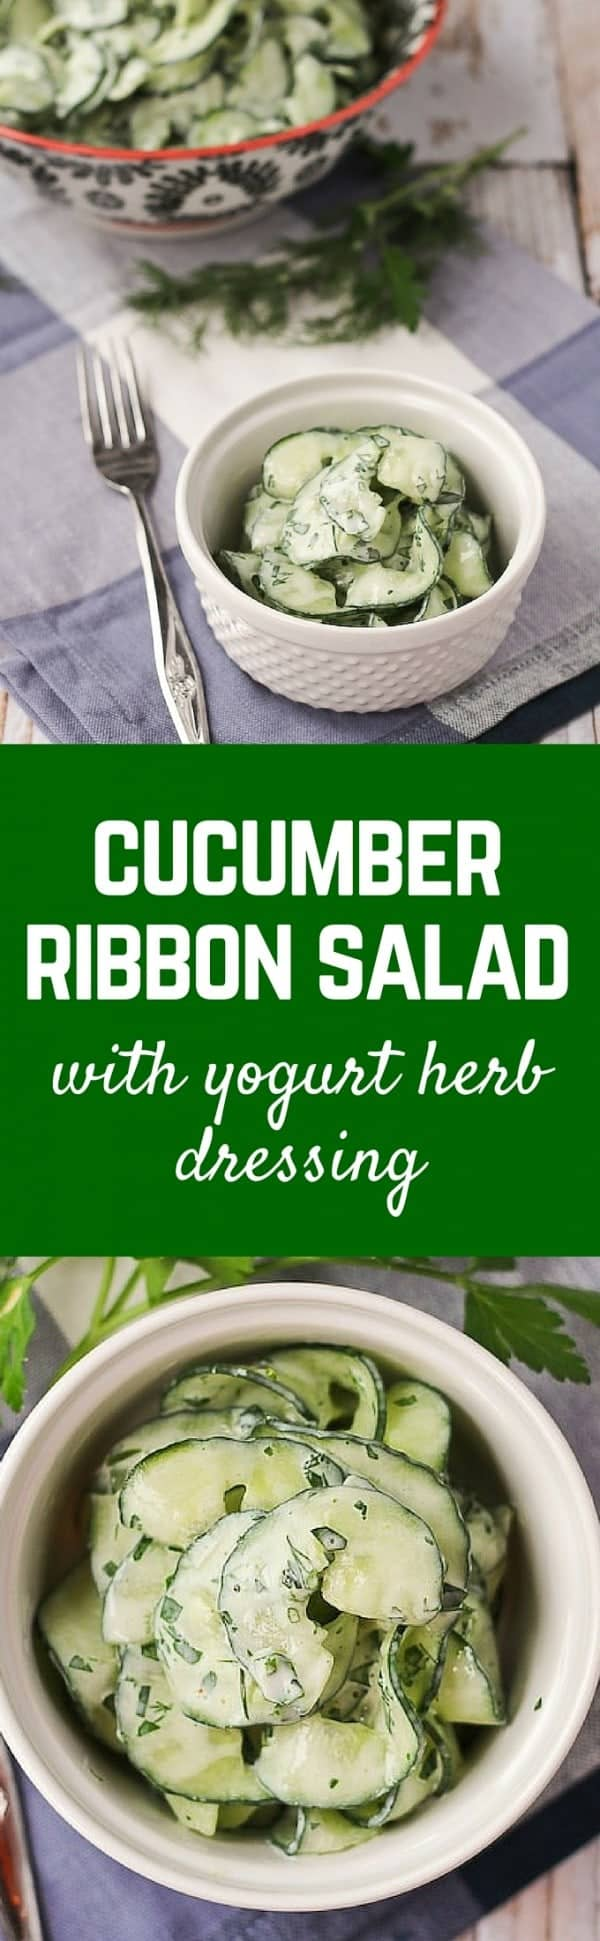 Cucumber Salad with Fat-Free Yogurt Herb Dressing - Get the easy salad recipe on RachelCooks.com